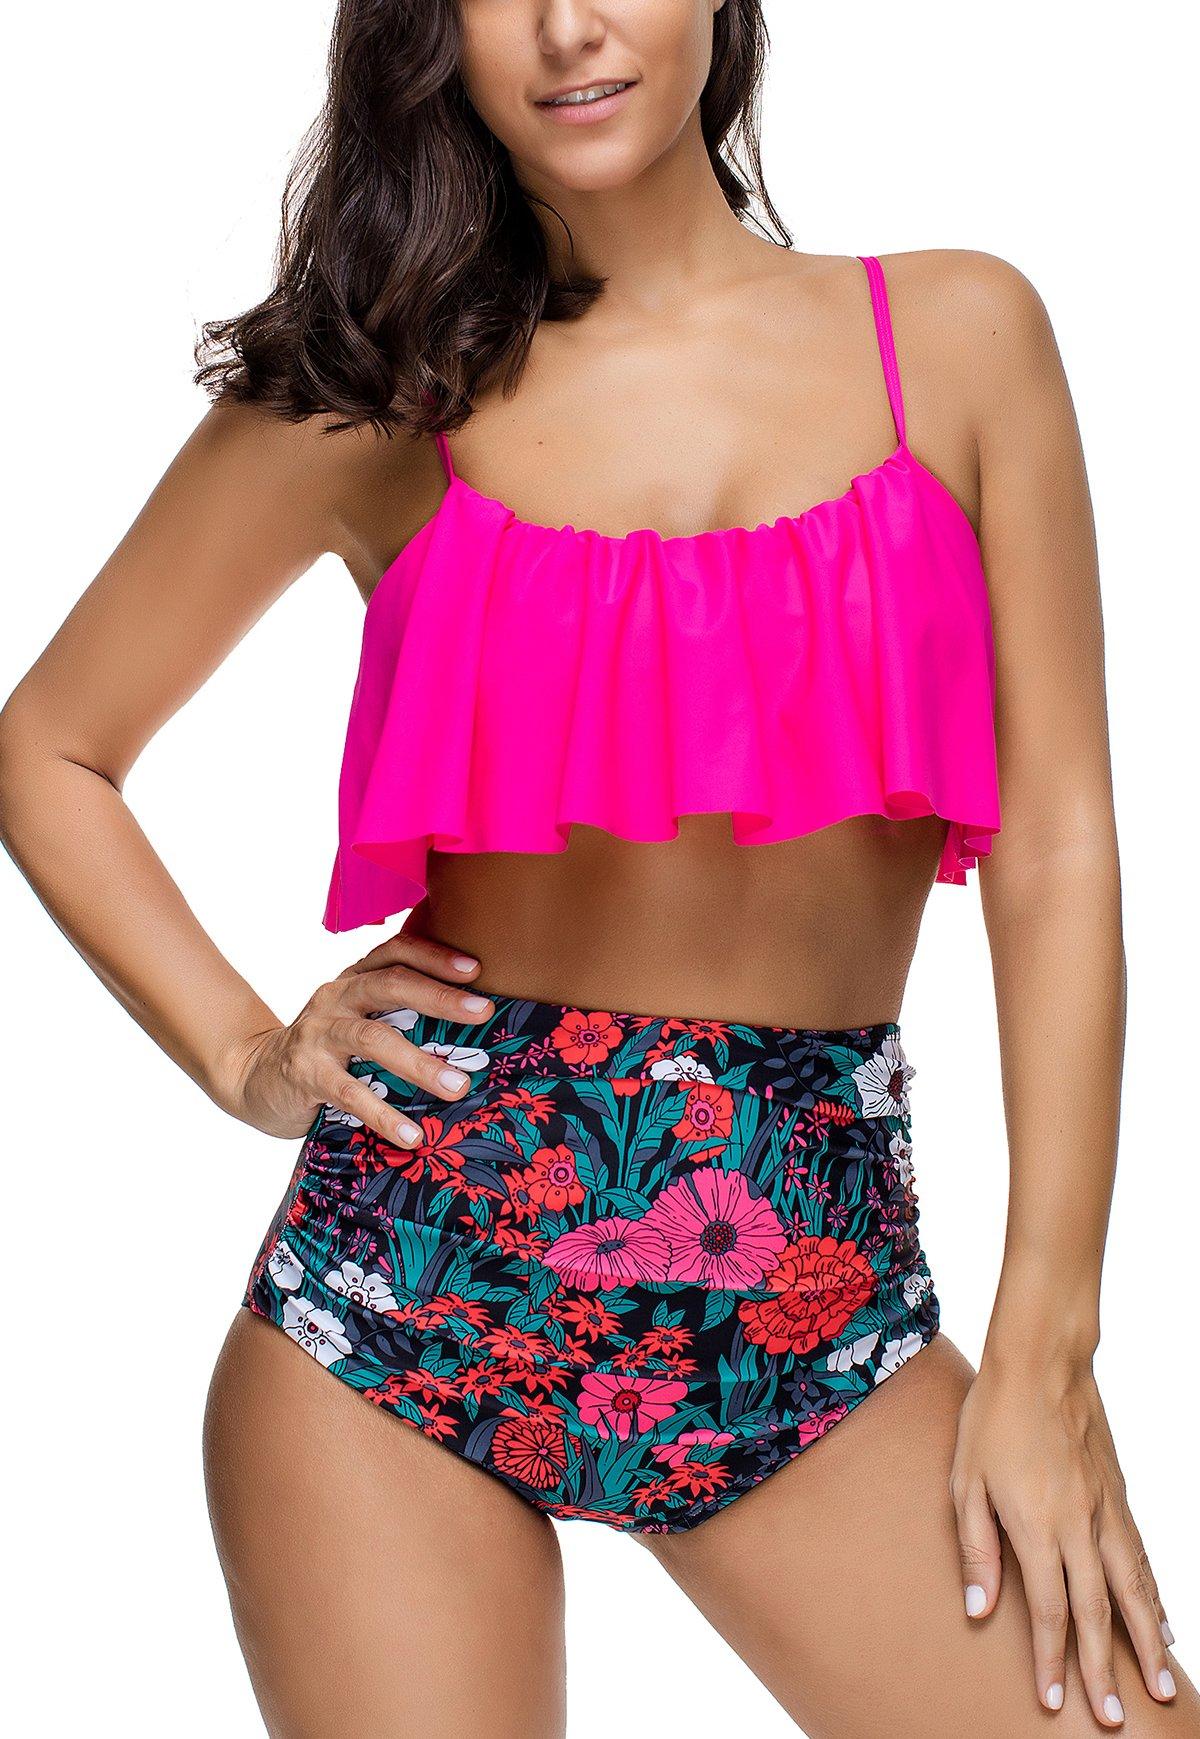 74942b6fa4a Womens Swimsuits Bikini Set High Waisted Ruffled Padded Bathing Suits  Vintage Split Swimwear, Rose Red, Medium